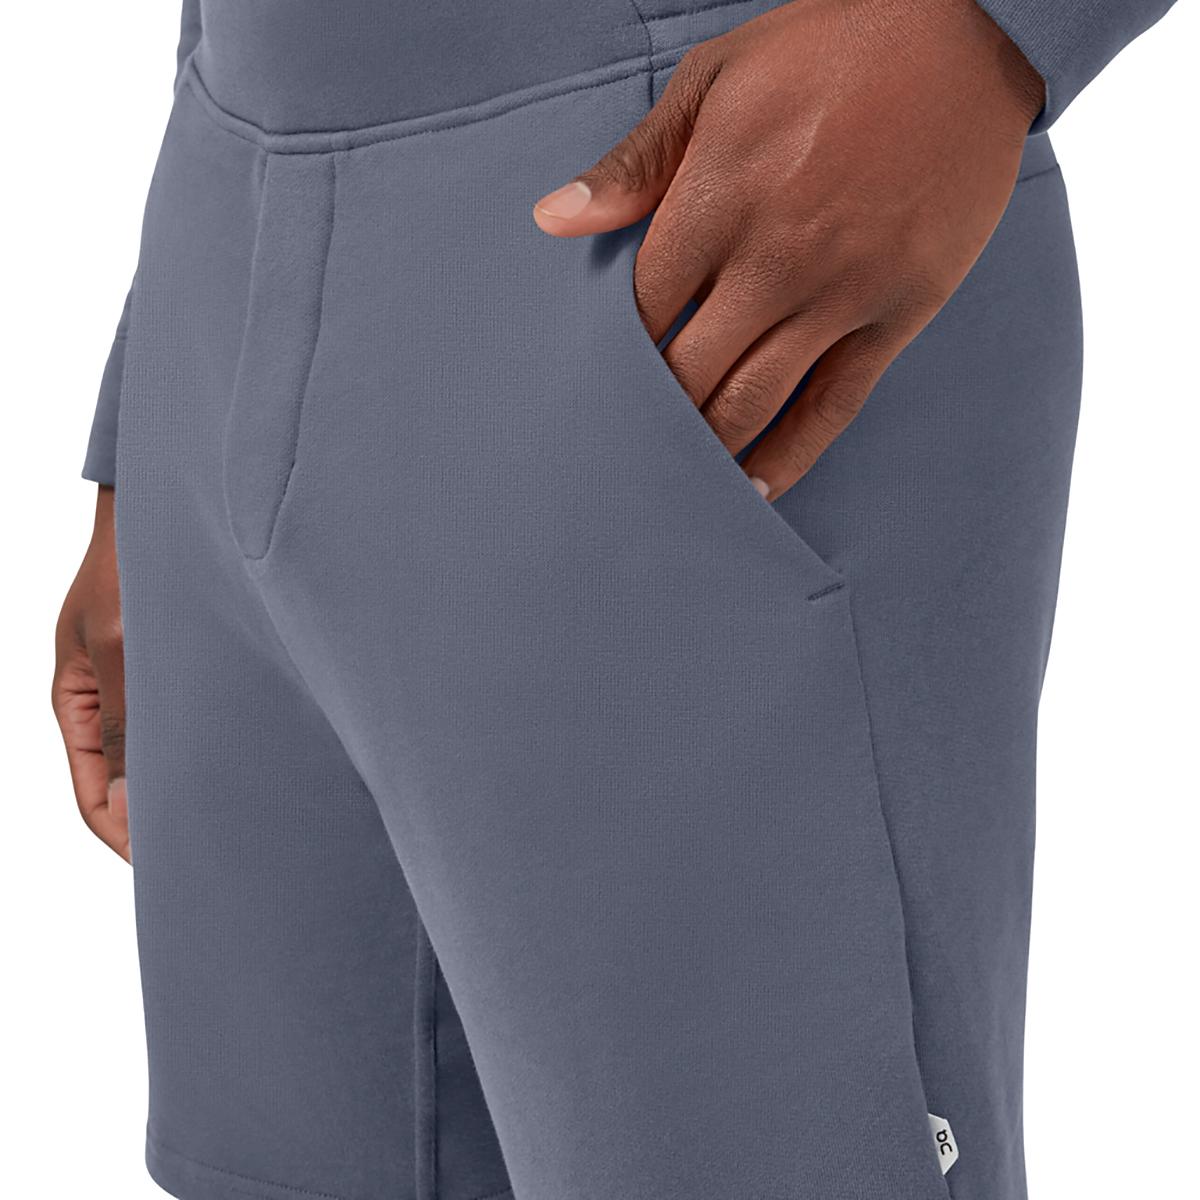 Men's On Sweat Shorts - Color: Dark - Size: S, Dark, large, image 5